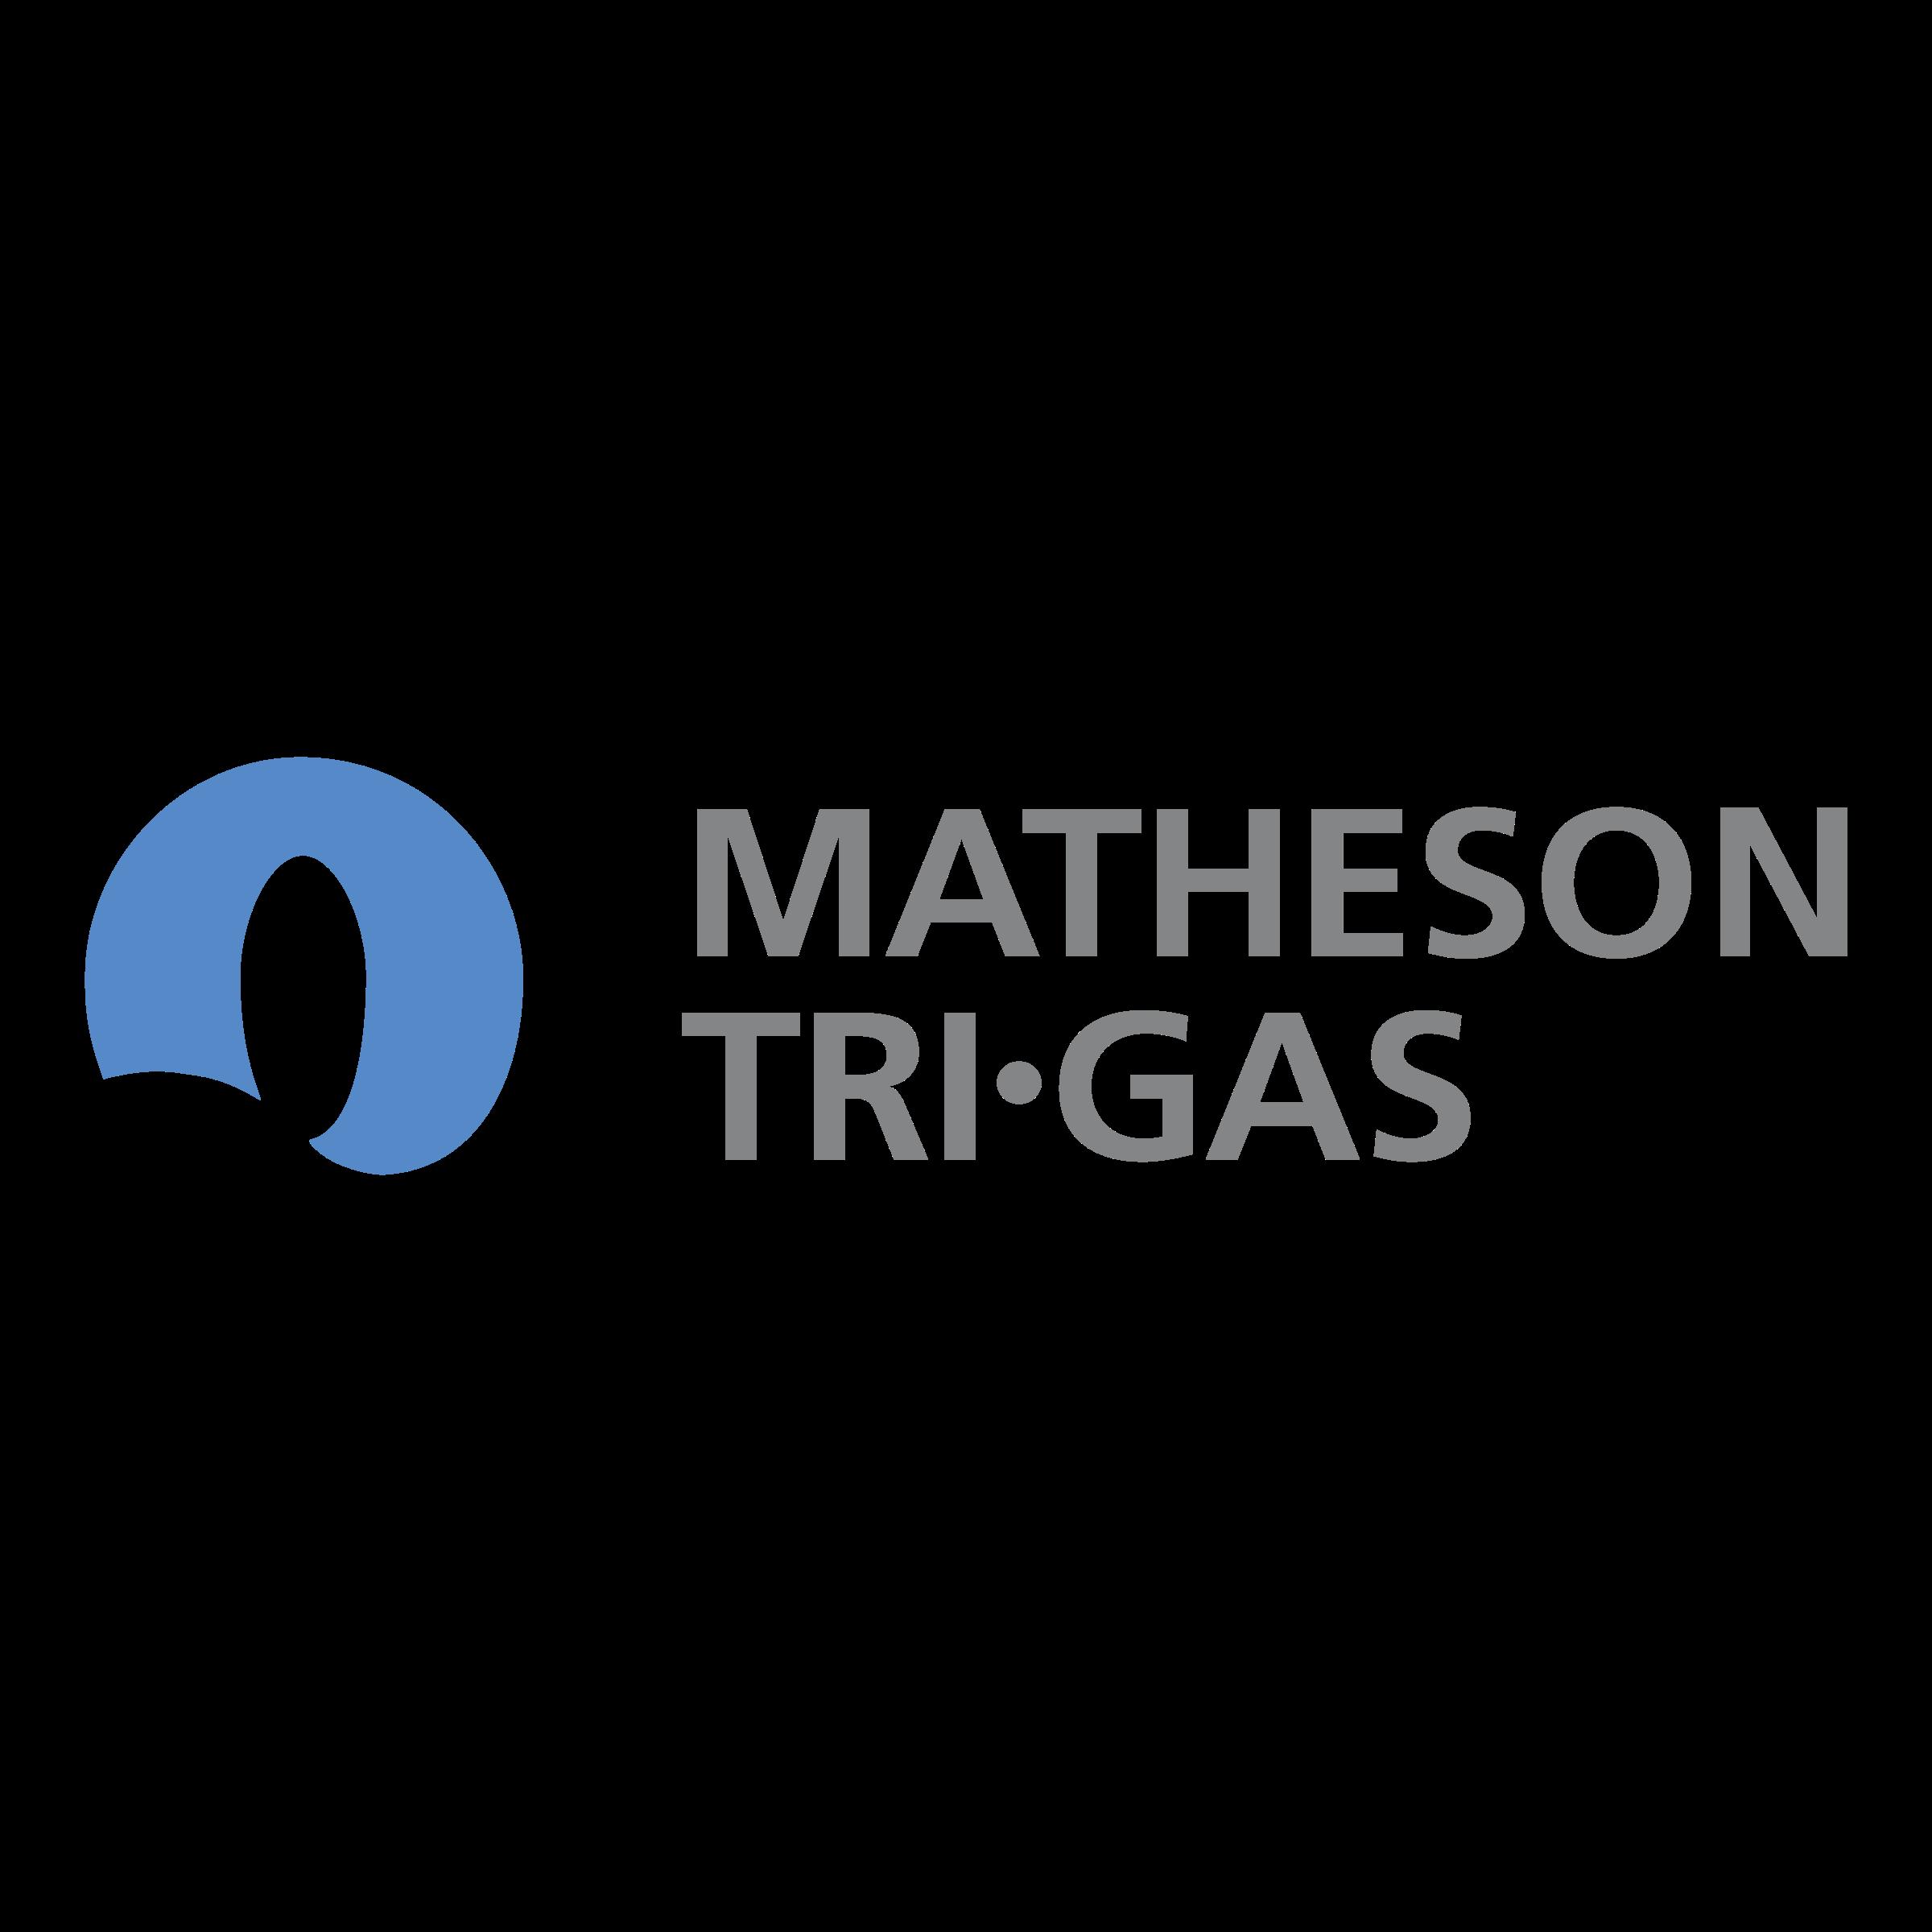 Matheson Tri GAS logo